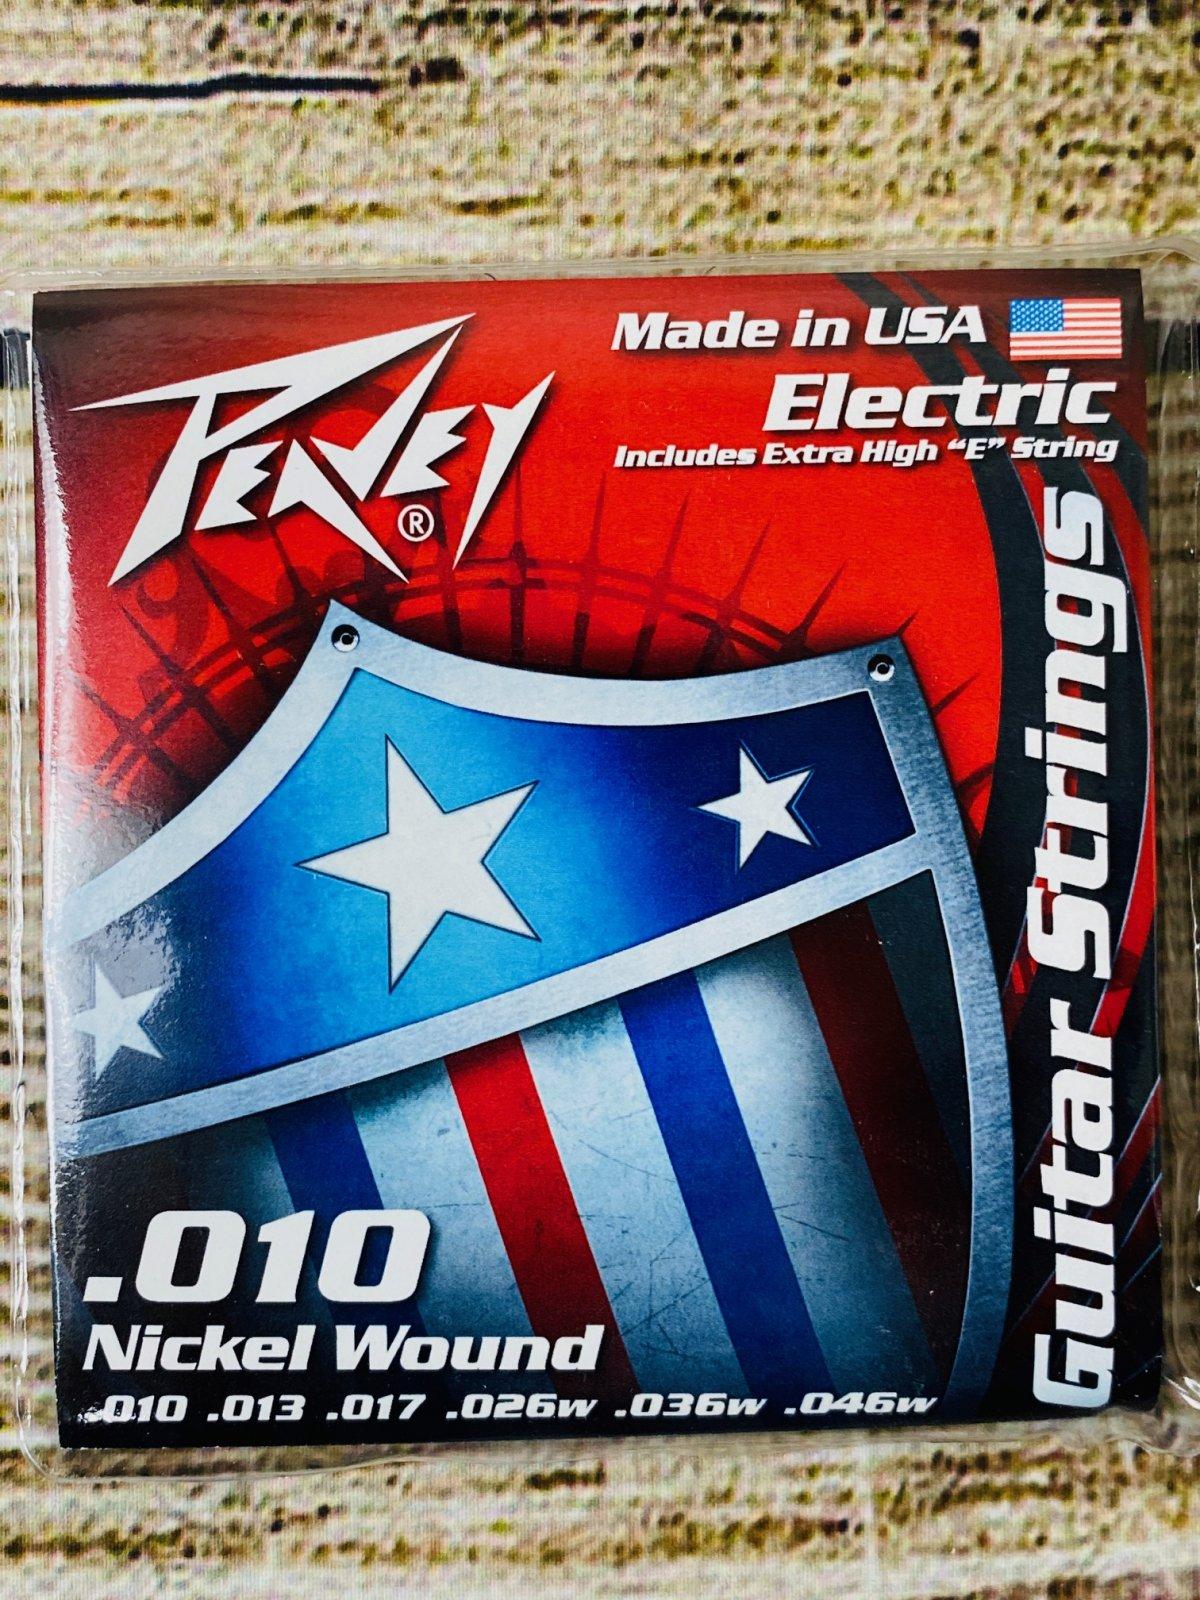 Peavey Nickel-Wound Electric Guitar Stings 10s